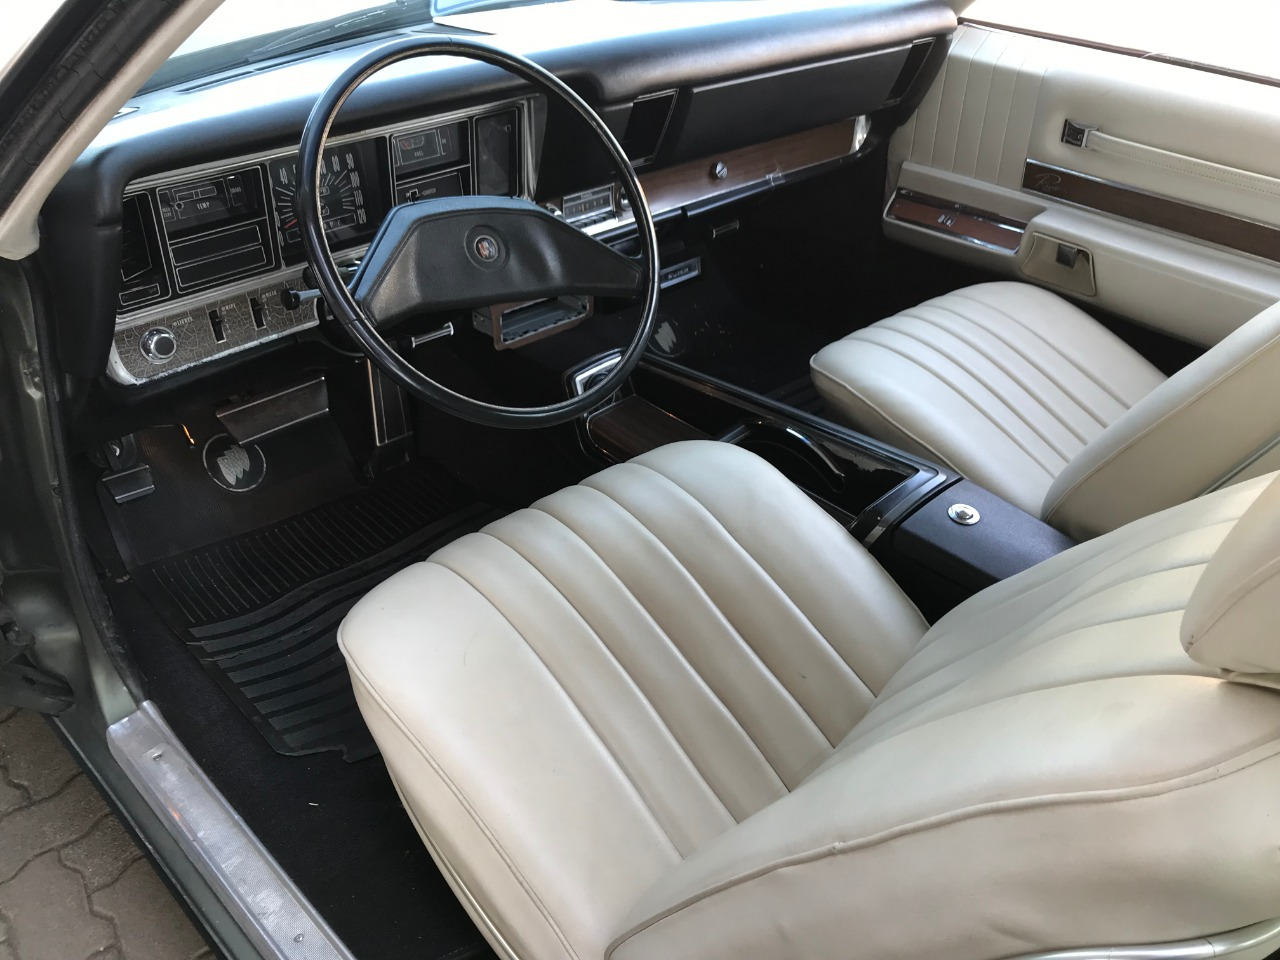 1970 Reviera Coupe 455 hemi V8 automatic